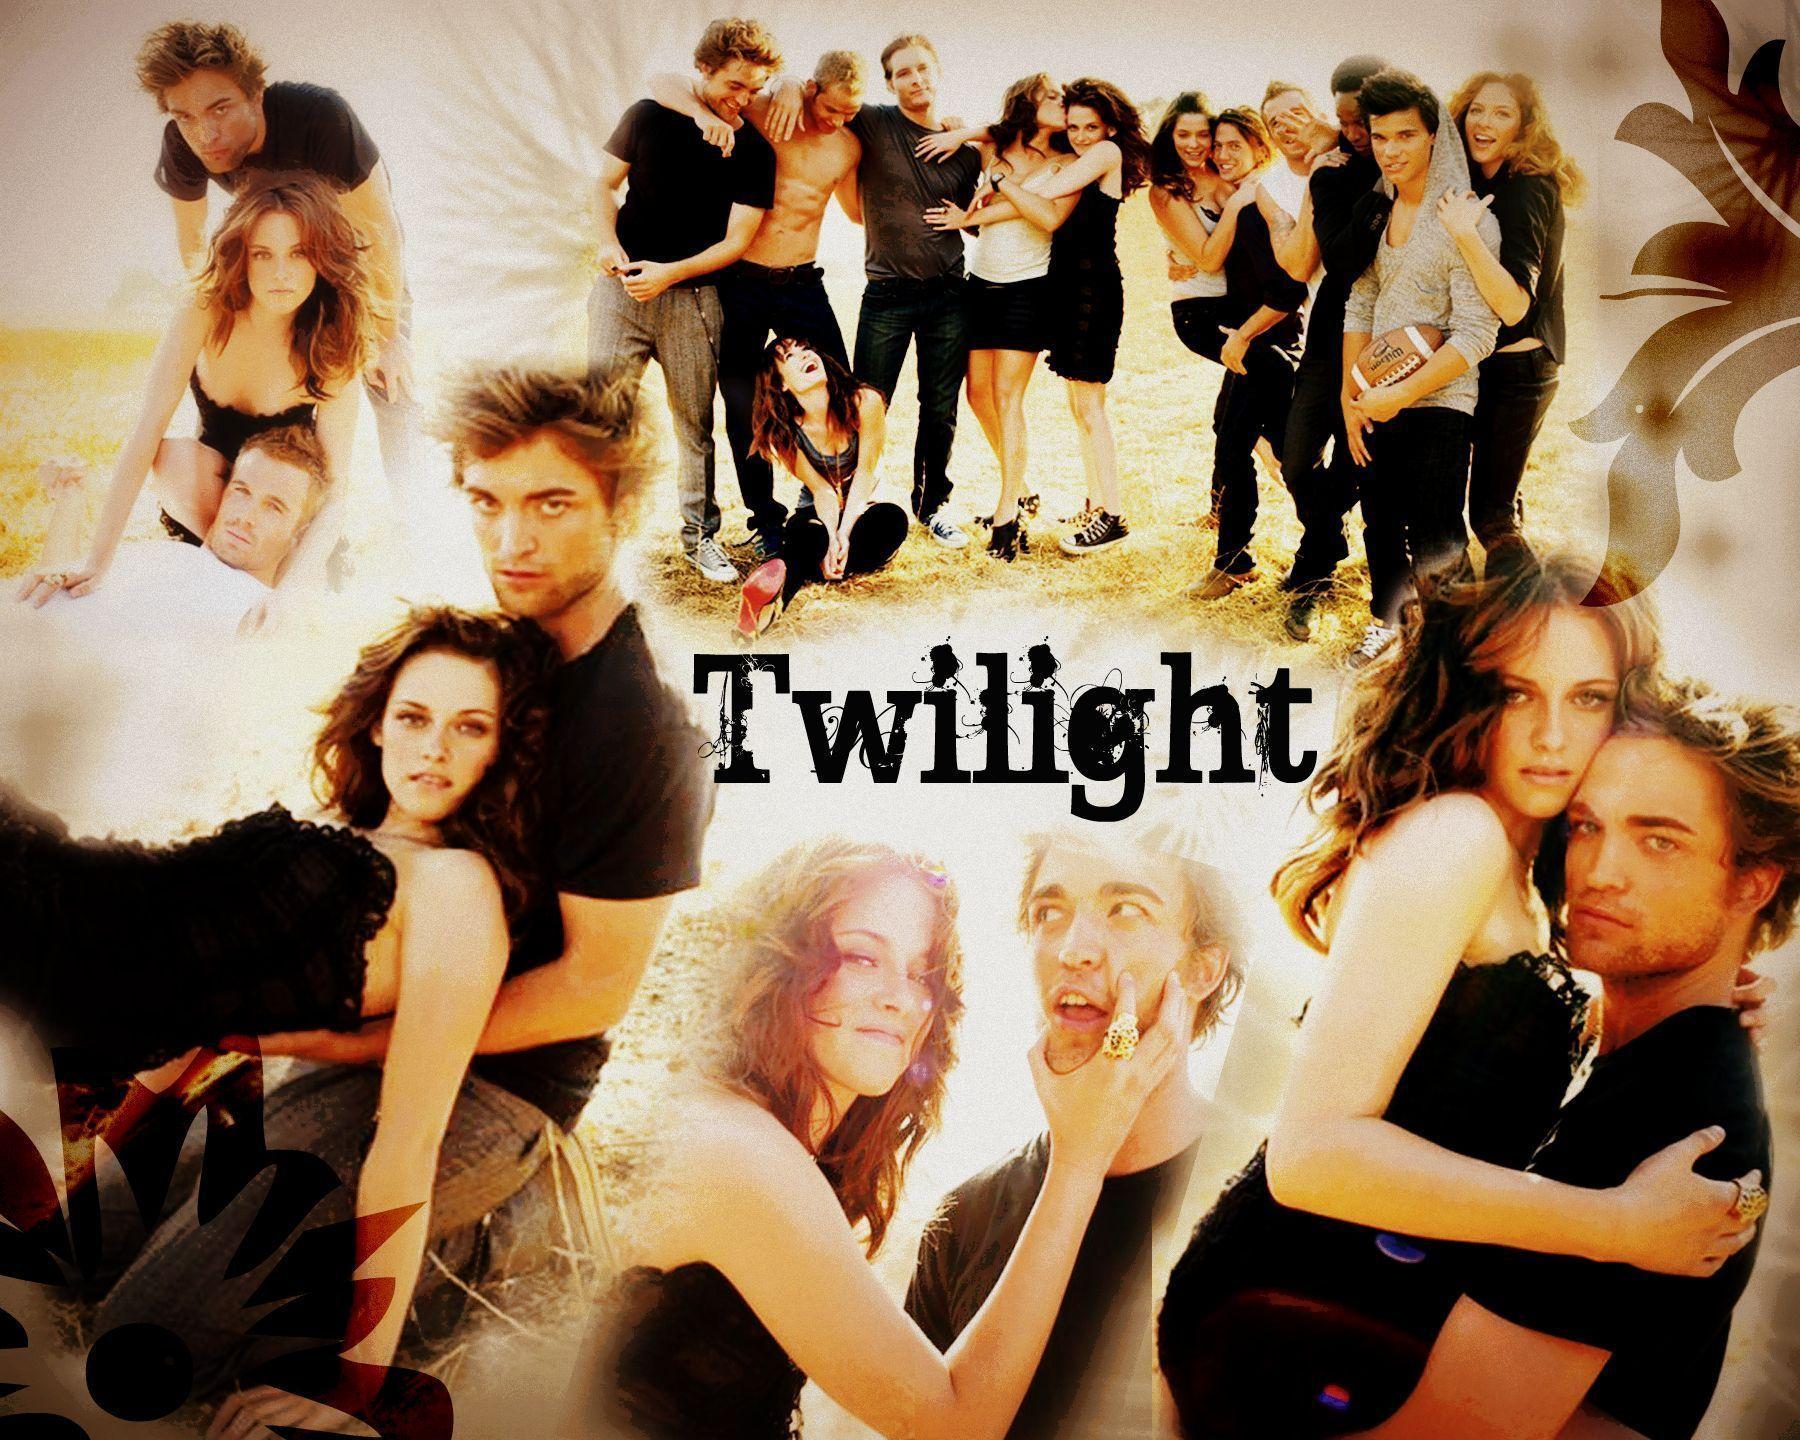 Twilight Saga Quotes Wallpaper Twilight Characters Images Twilight Cast Vanity Fair Shoot